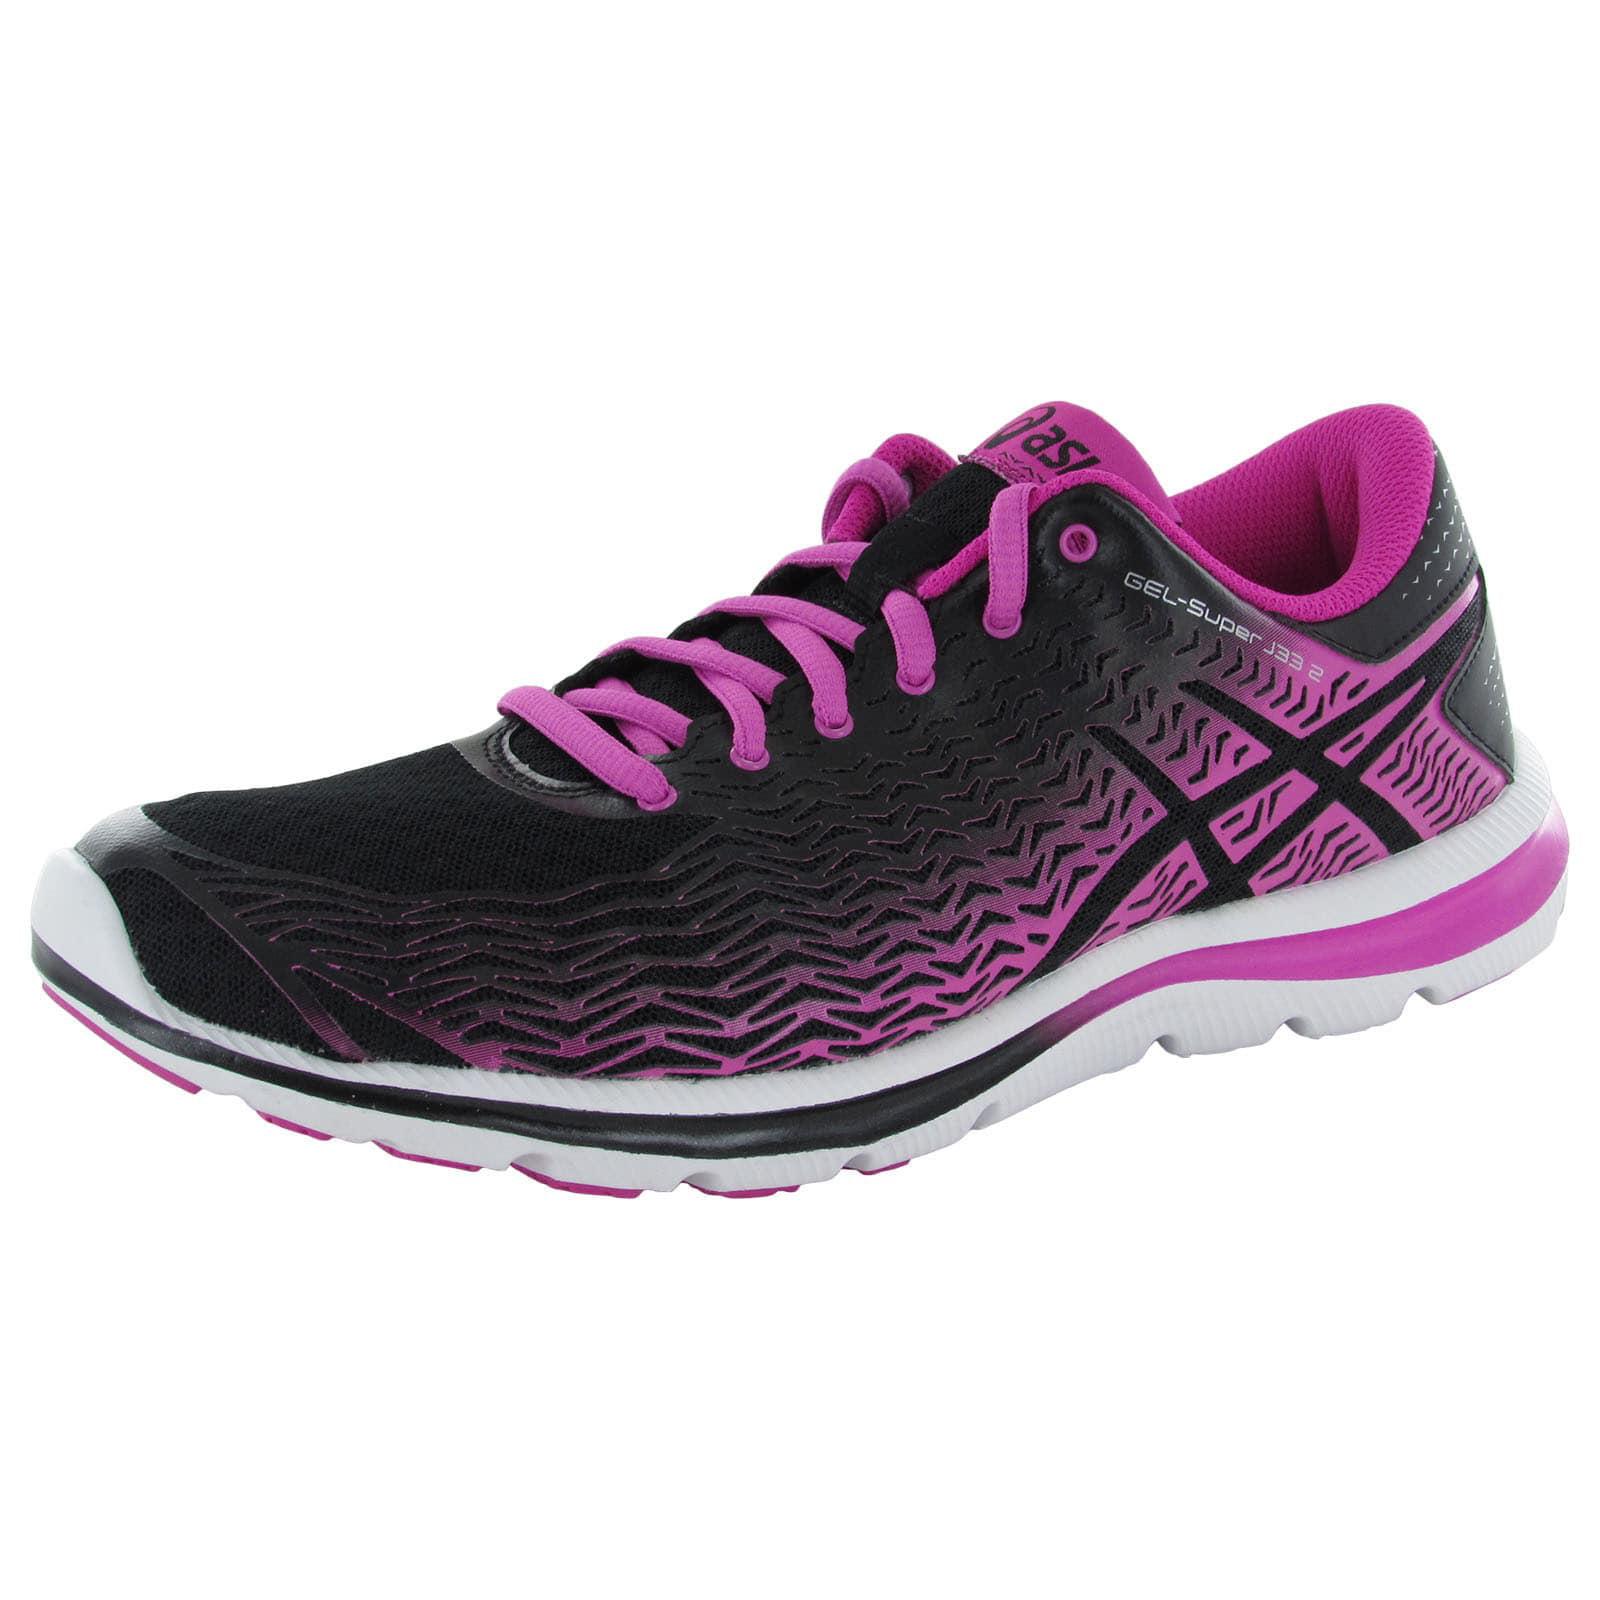 ASICS asics women's gel super j33 2 w running shoe, blackpink glowsilver, 9 m us